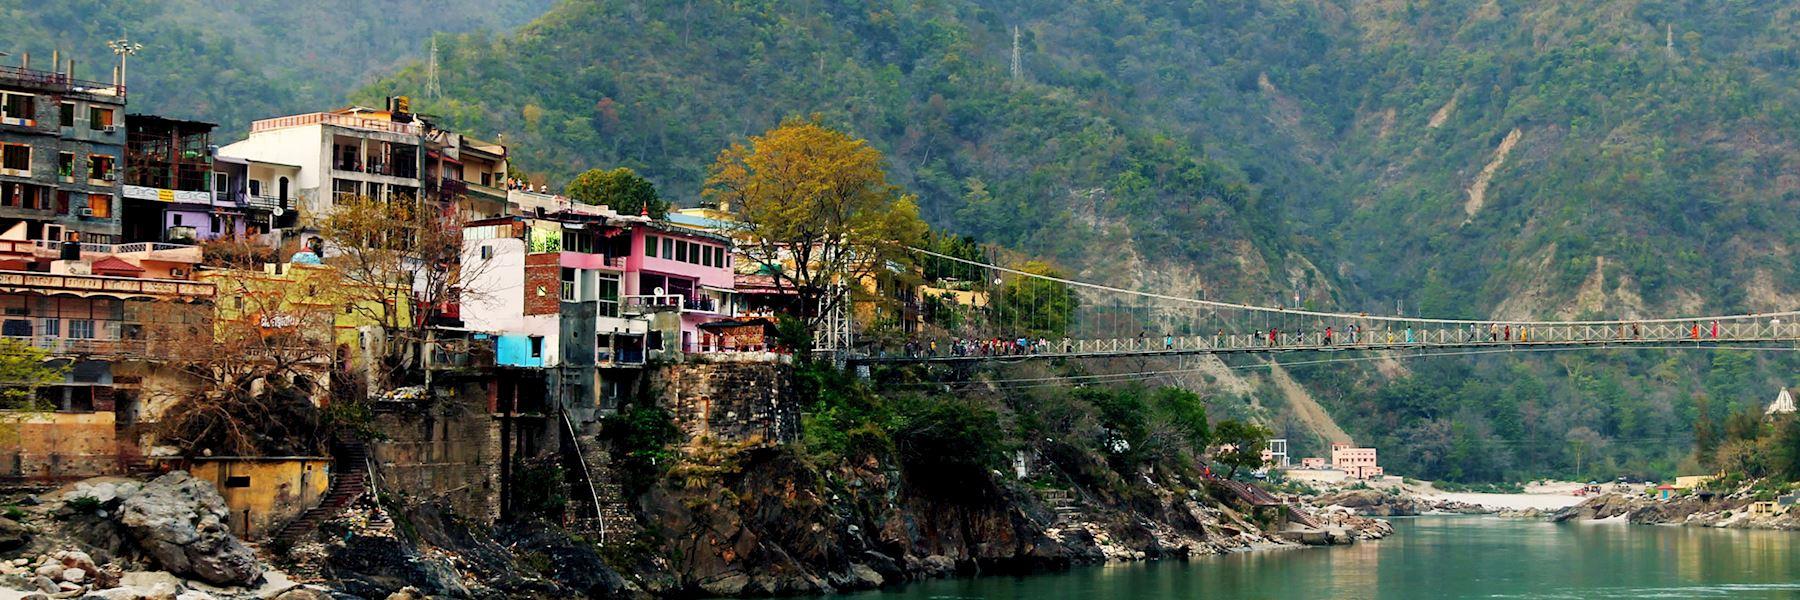 Visit Rishikesh, India